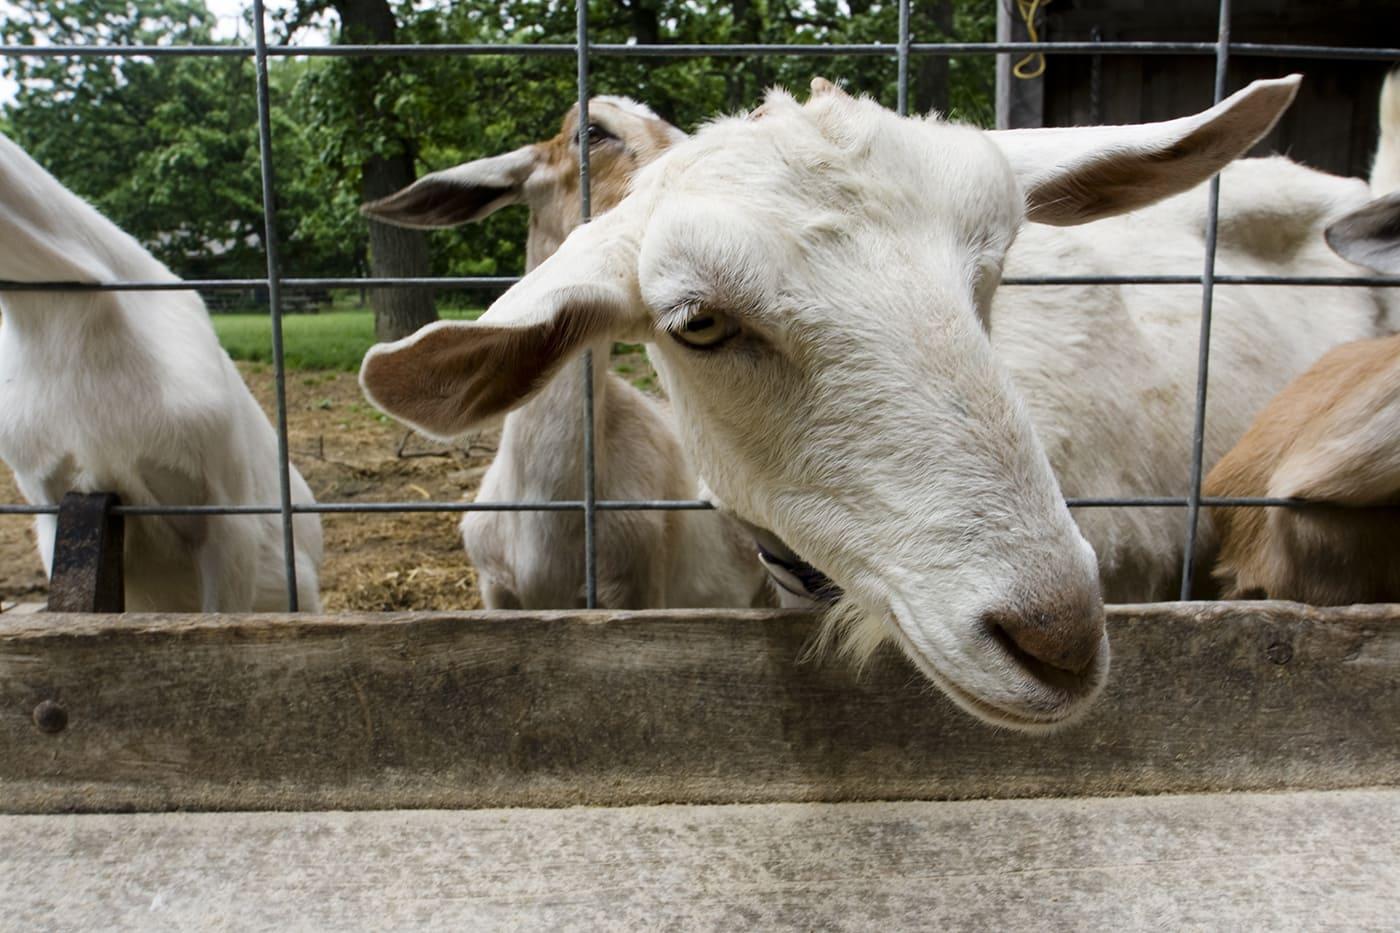 Goat at Angelic Organics in Caledonia, Illinois.